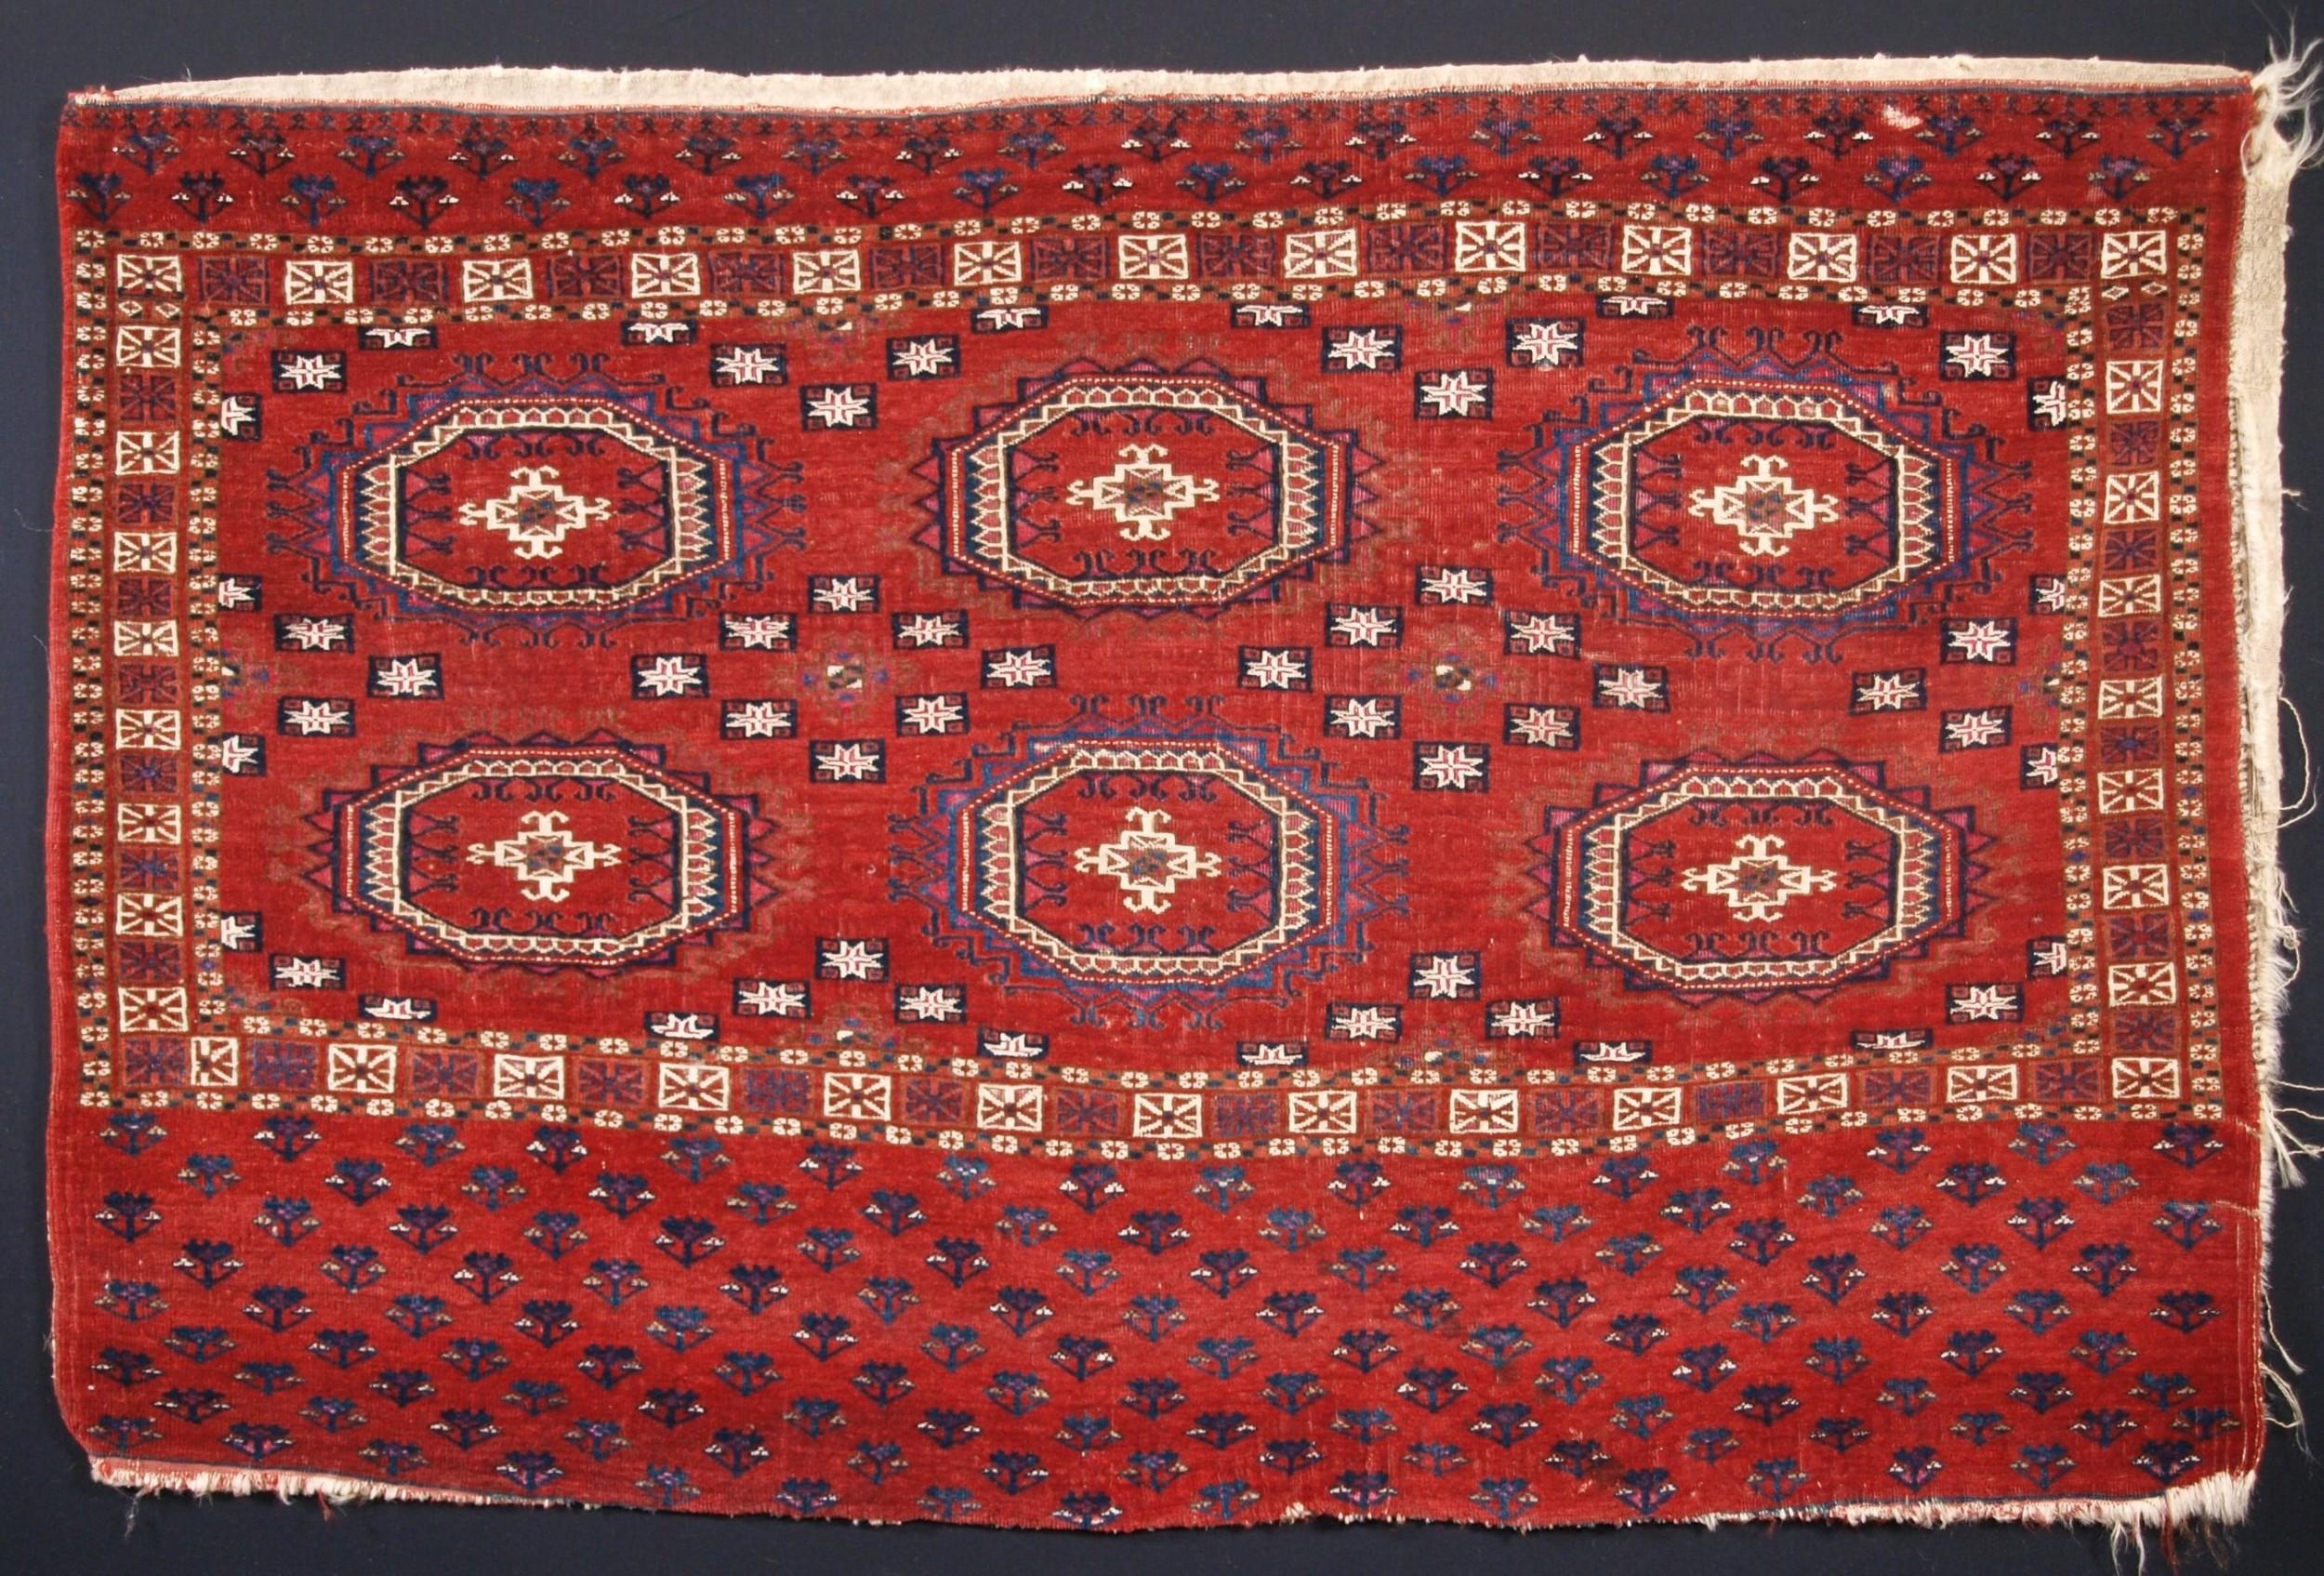 antique tekke turkmen chuval silk and cotton highlights salor guls circa 1825